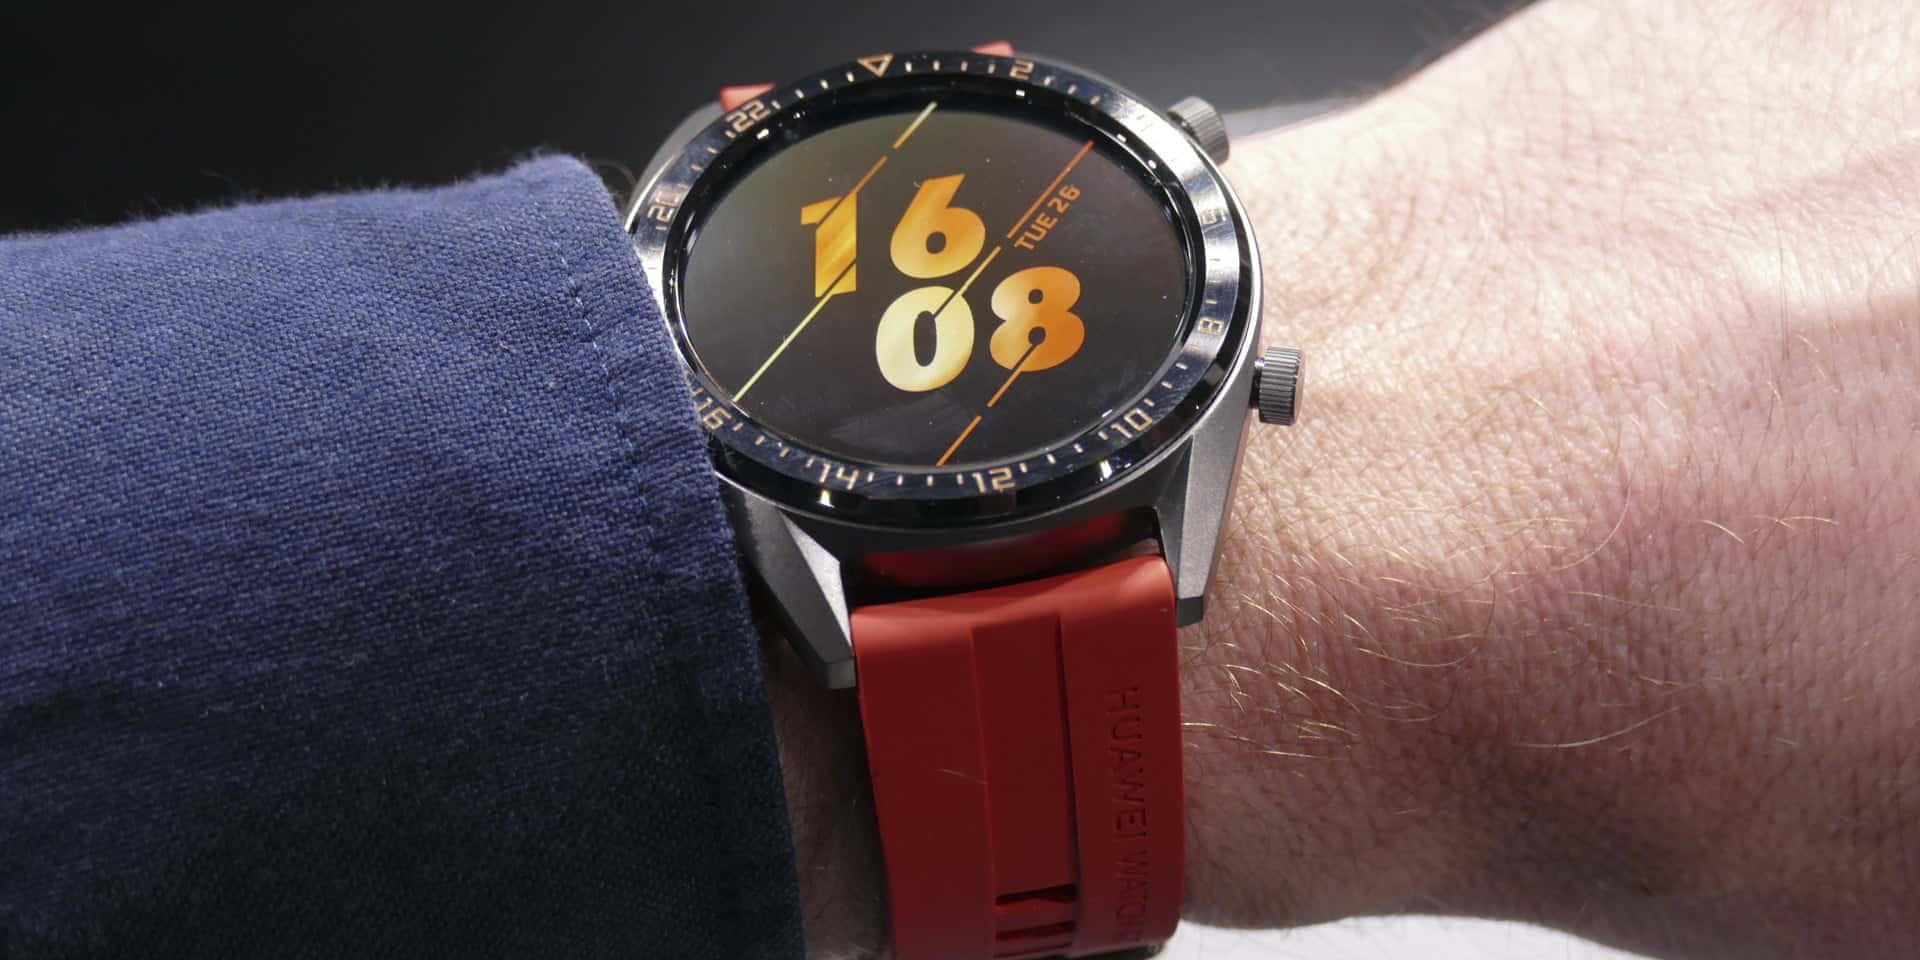 1 bon montre cardio